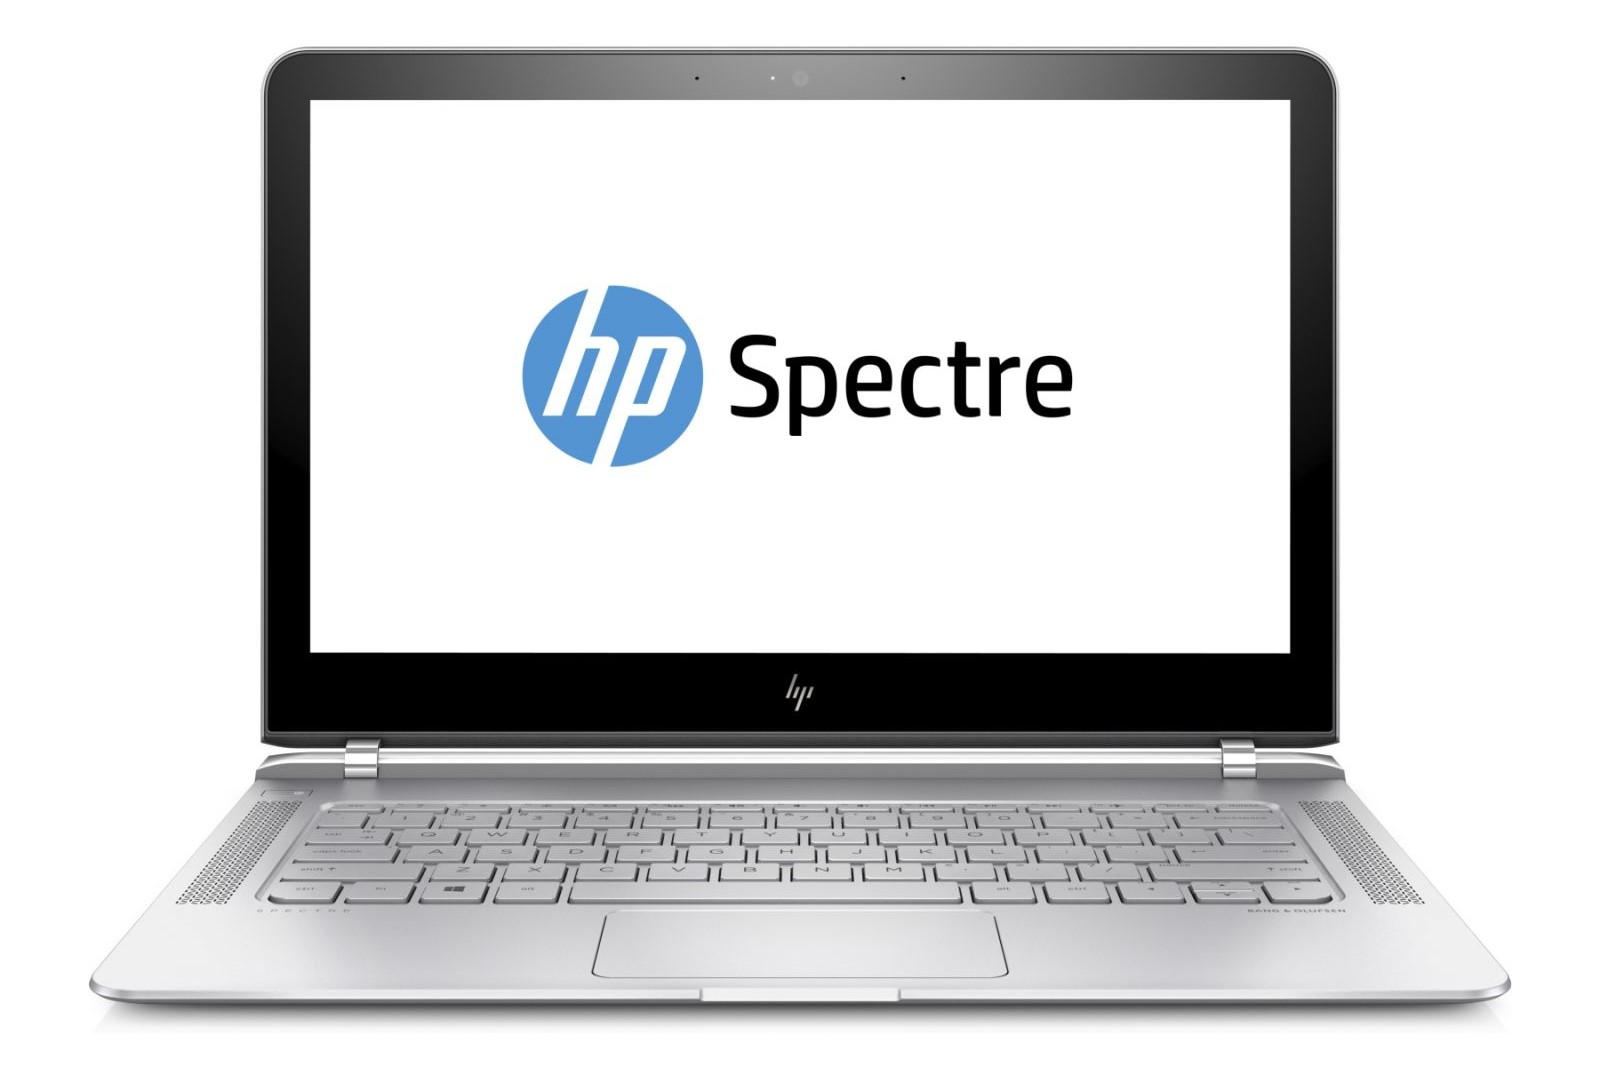 Hp Spectre 13-v184nz